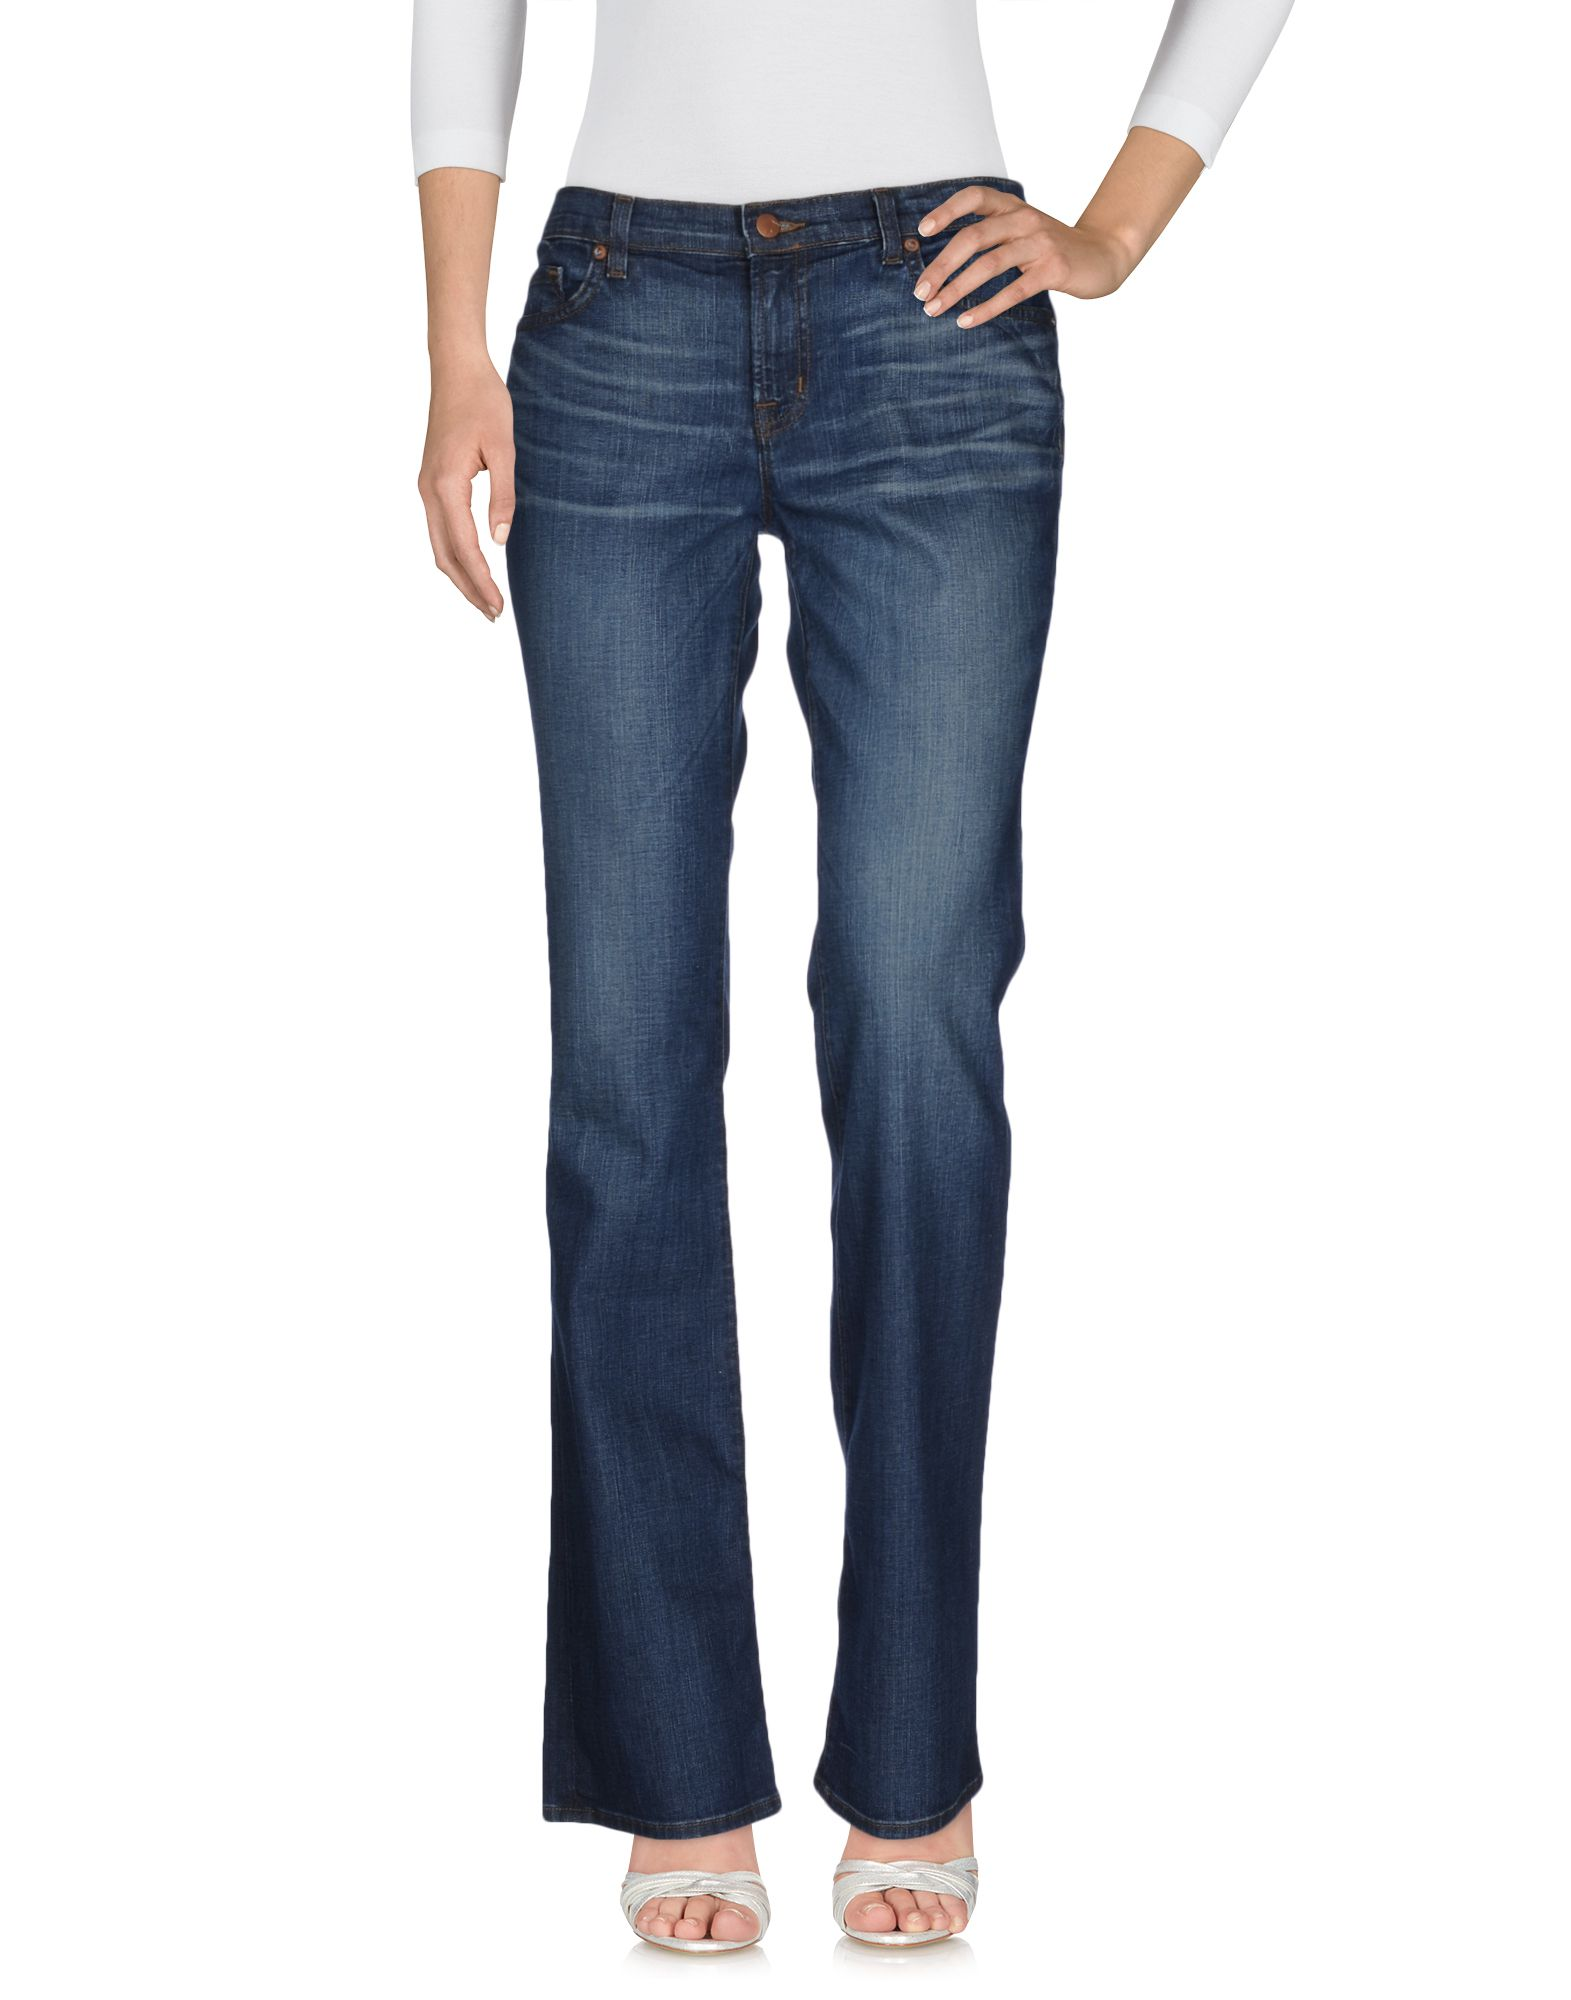 Pantaloni Jeans J Brand Donna - Acquista online su vO9a6Aq